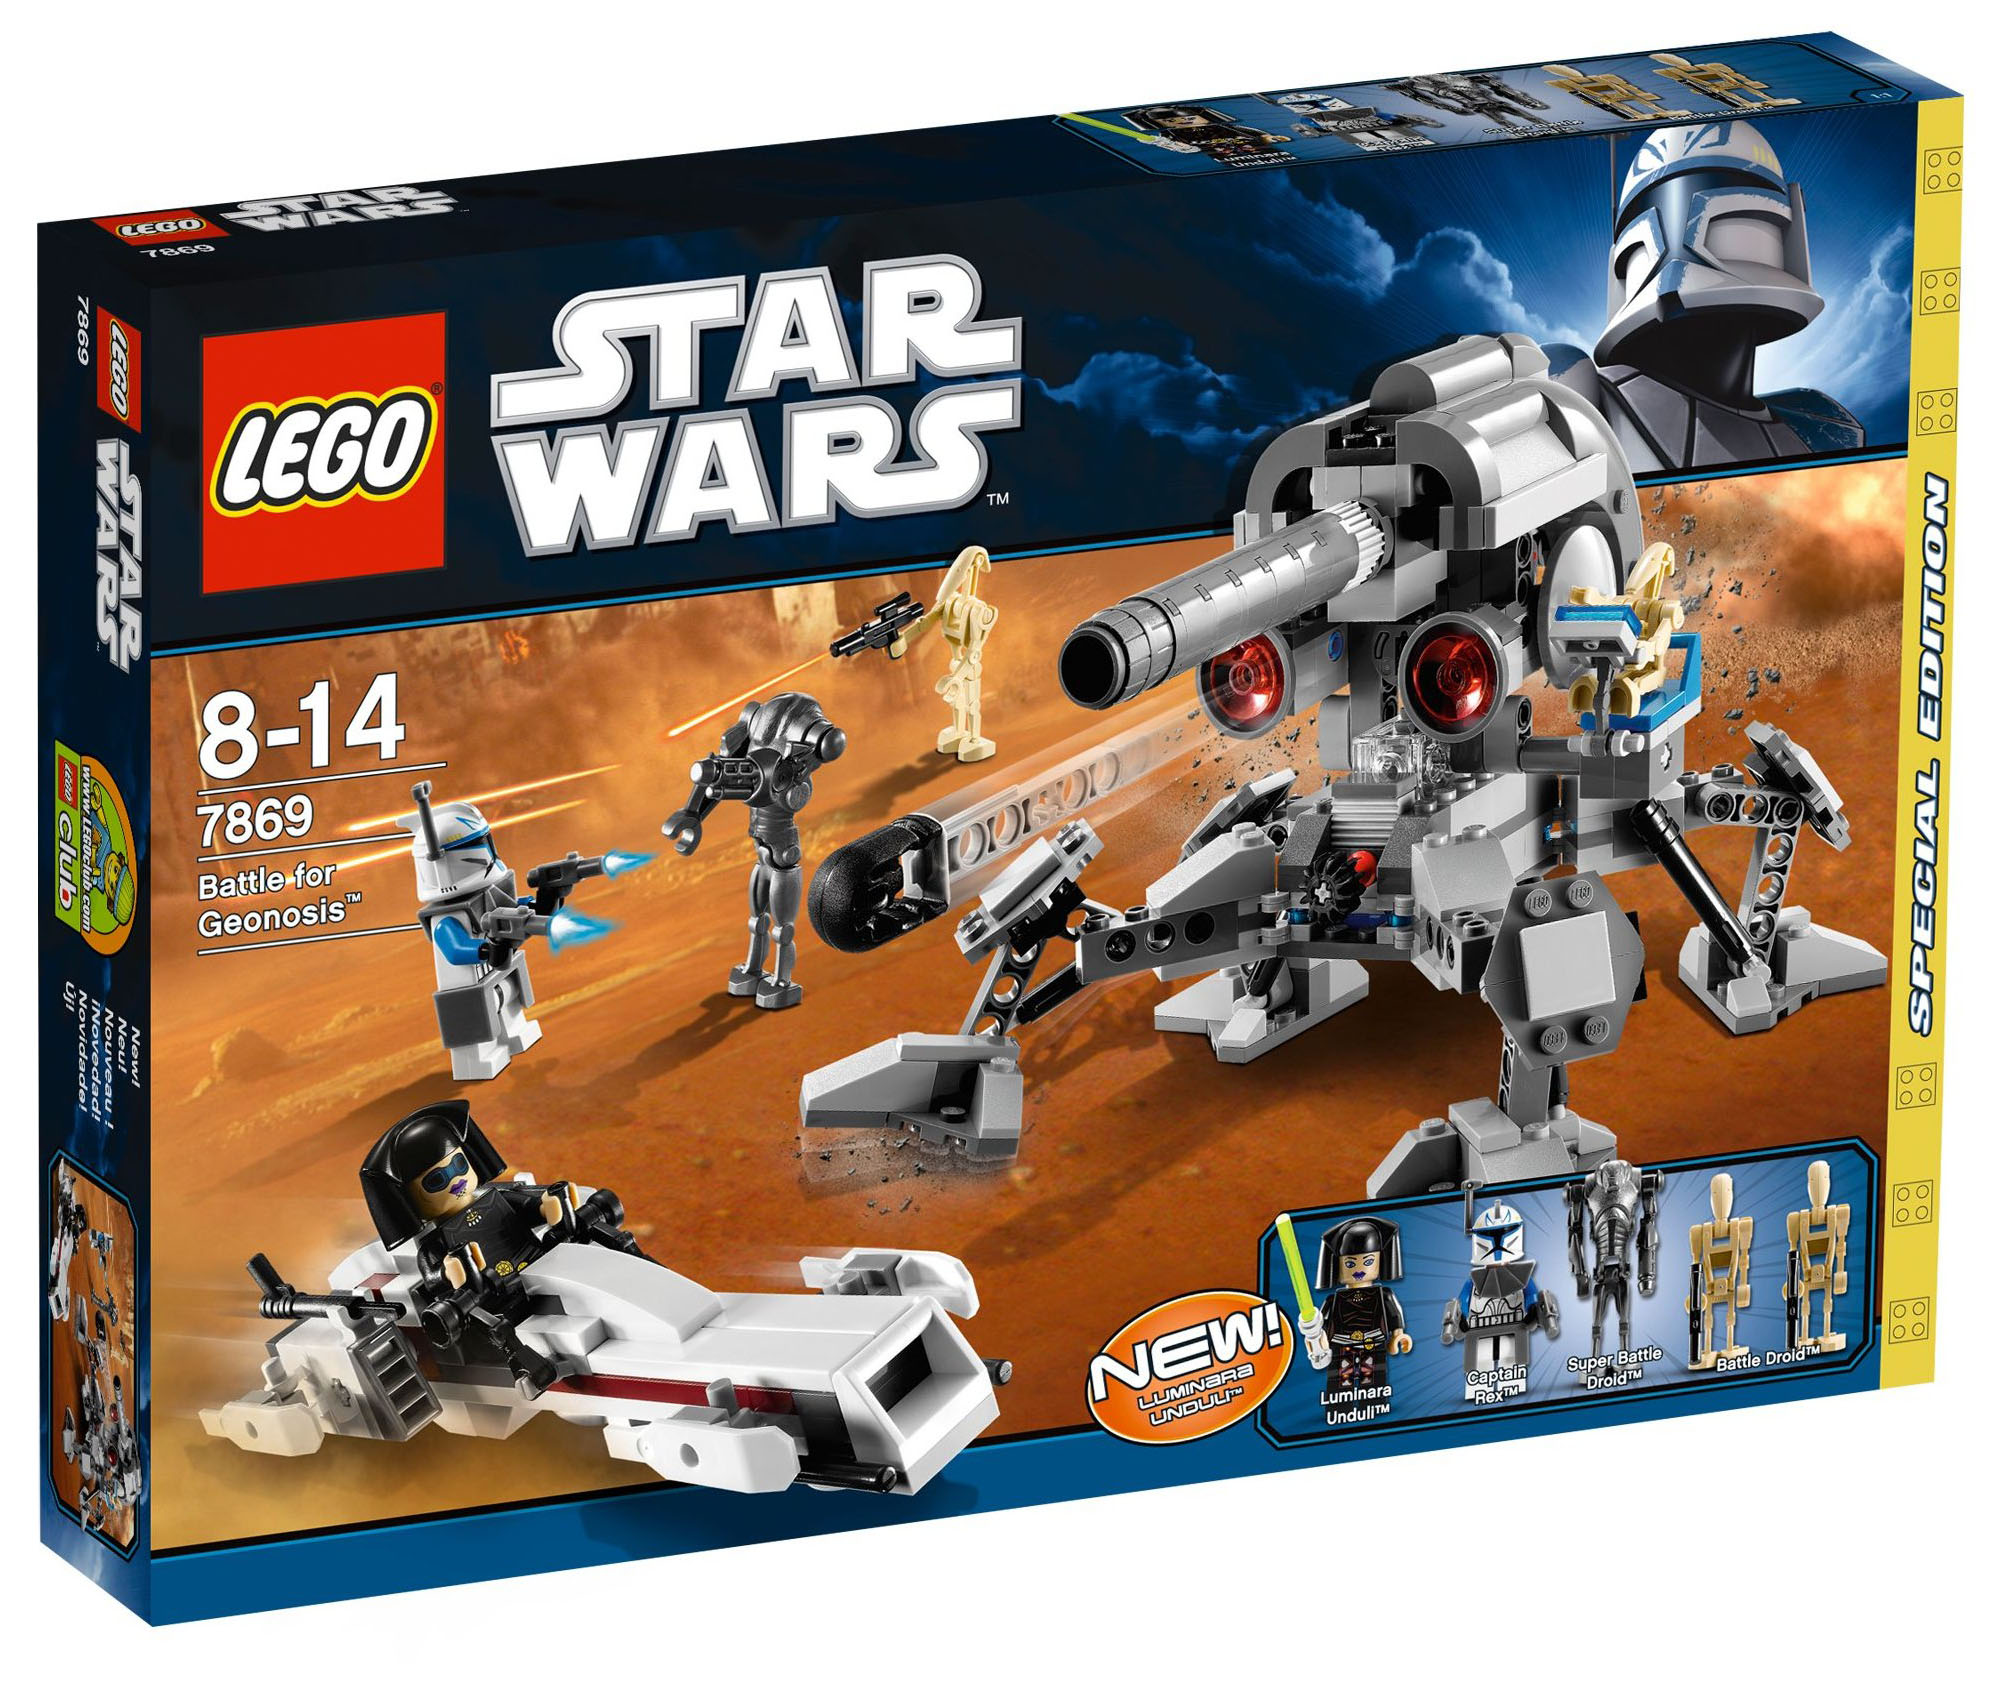 Lego star wars 7869 pas cher battle for geonosis - Bd lego star wars ...